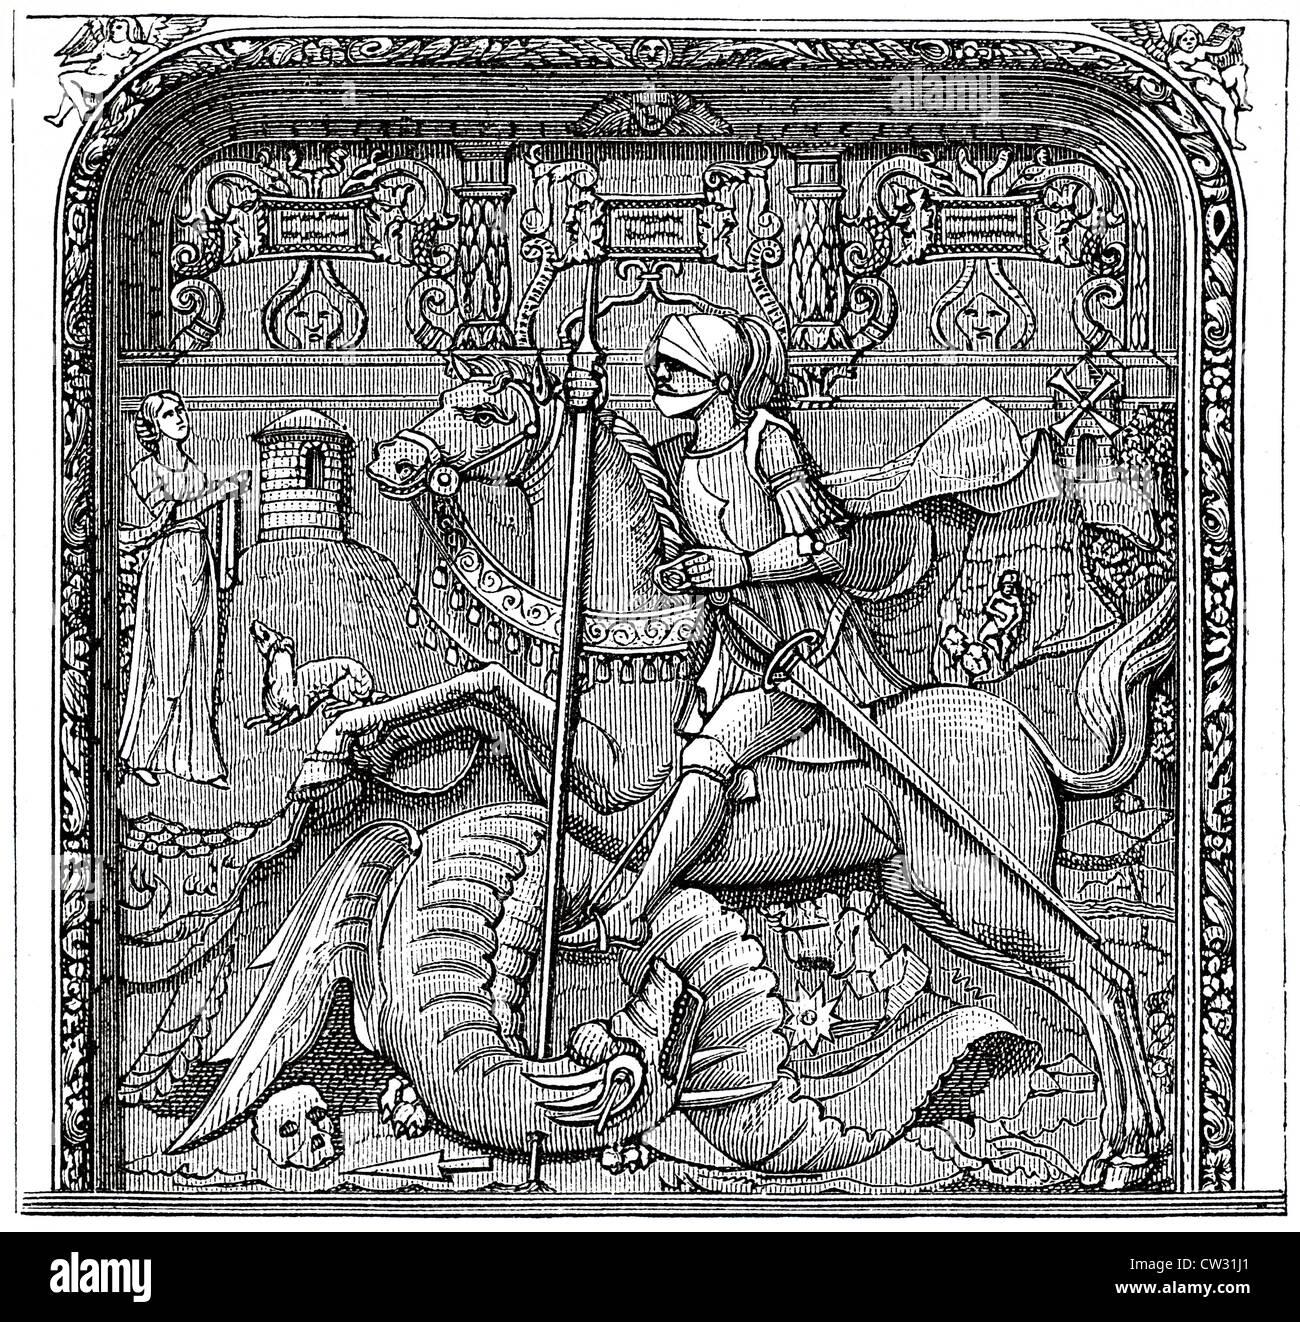 St. George the dragon slayer - Stock Image